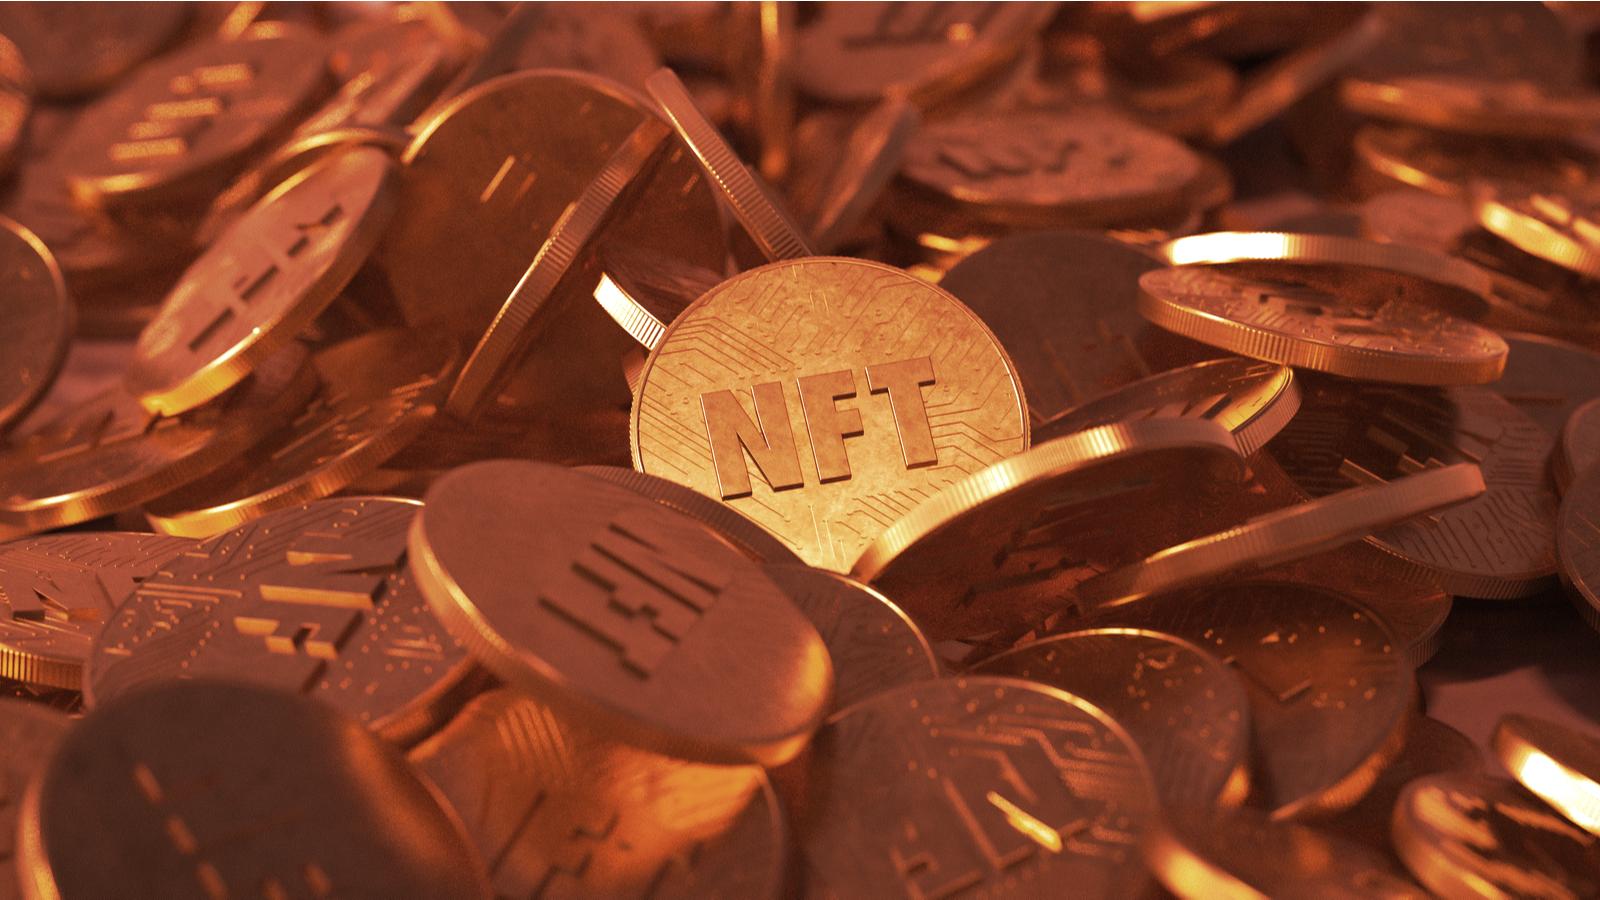 NFT Marketplace Rarible Raises $14.2 To Expand on Flow Blockchain